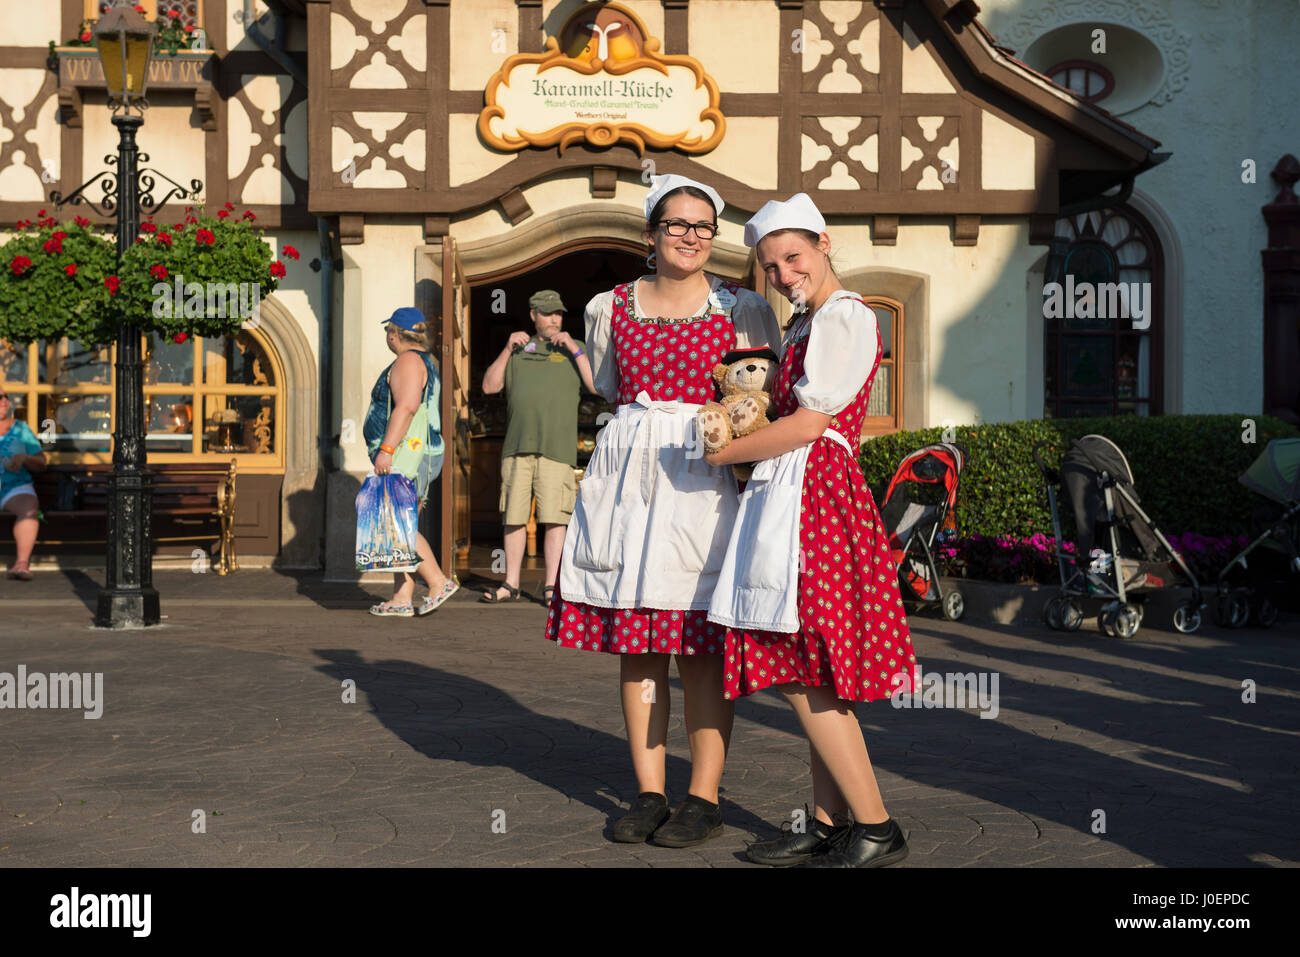 Karamell Kuche Epcot Germany Pavilion Disney World Orlando Stock